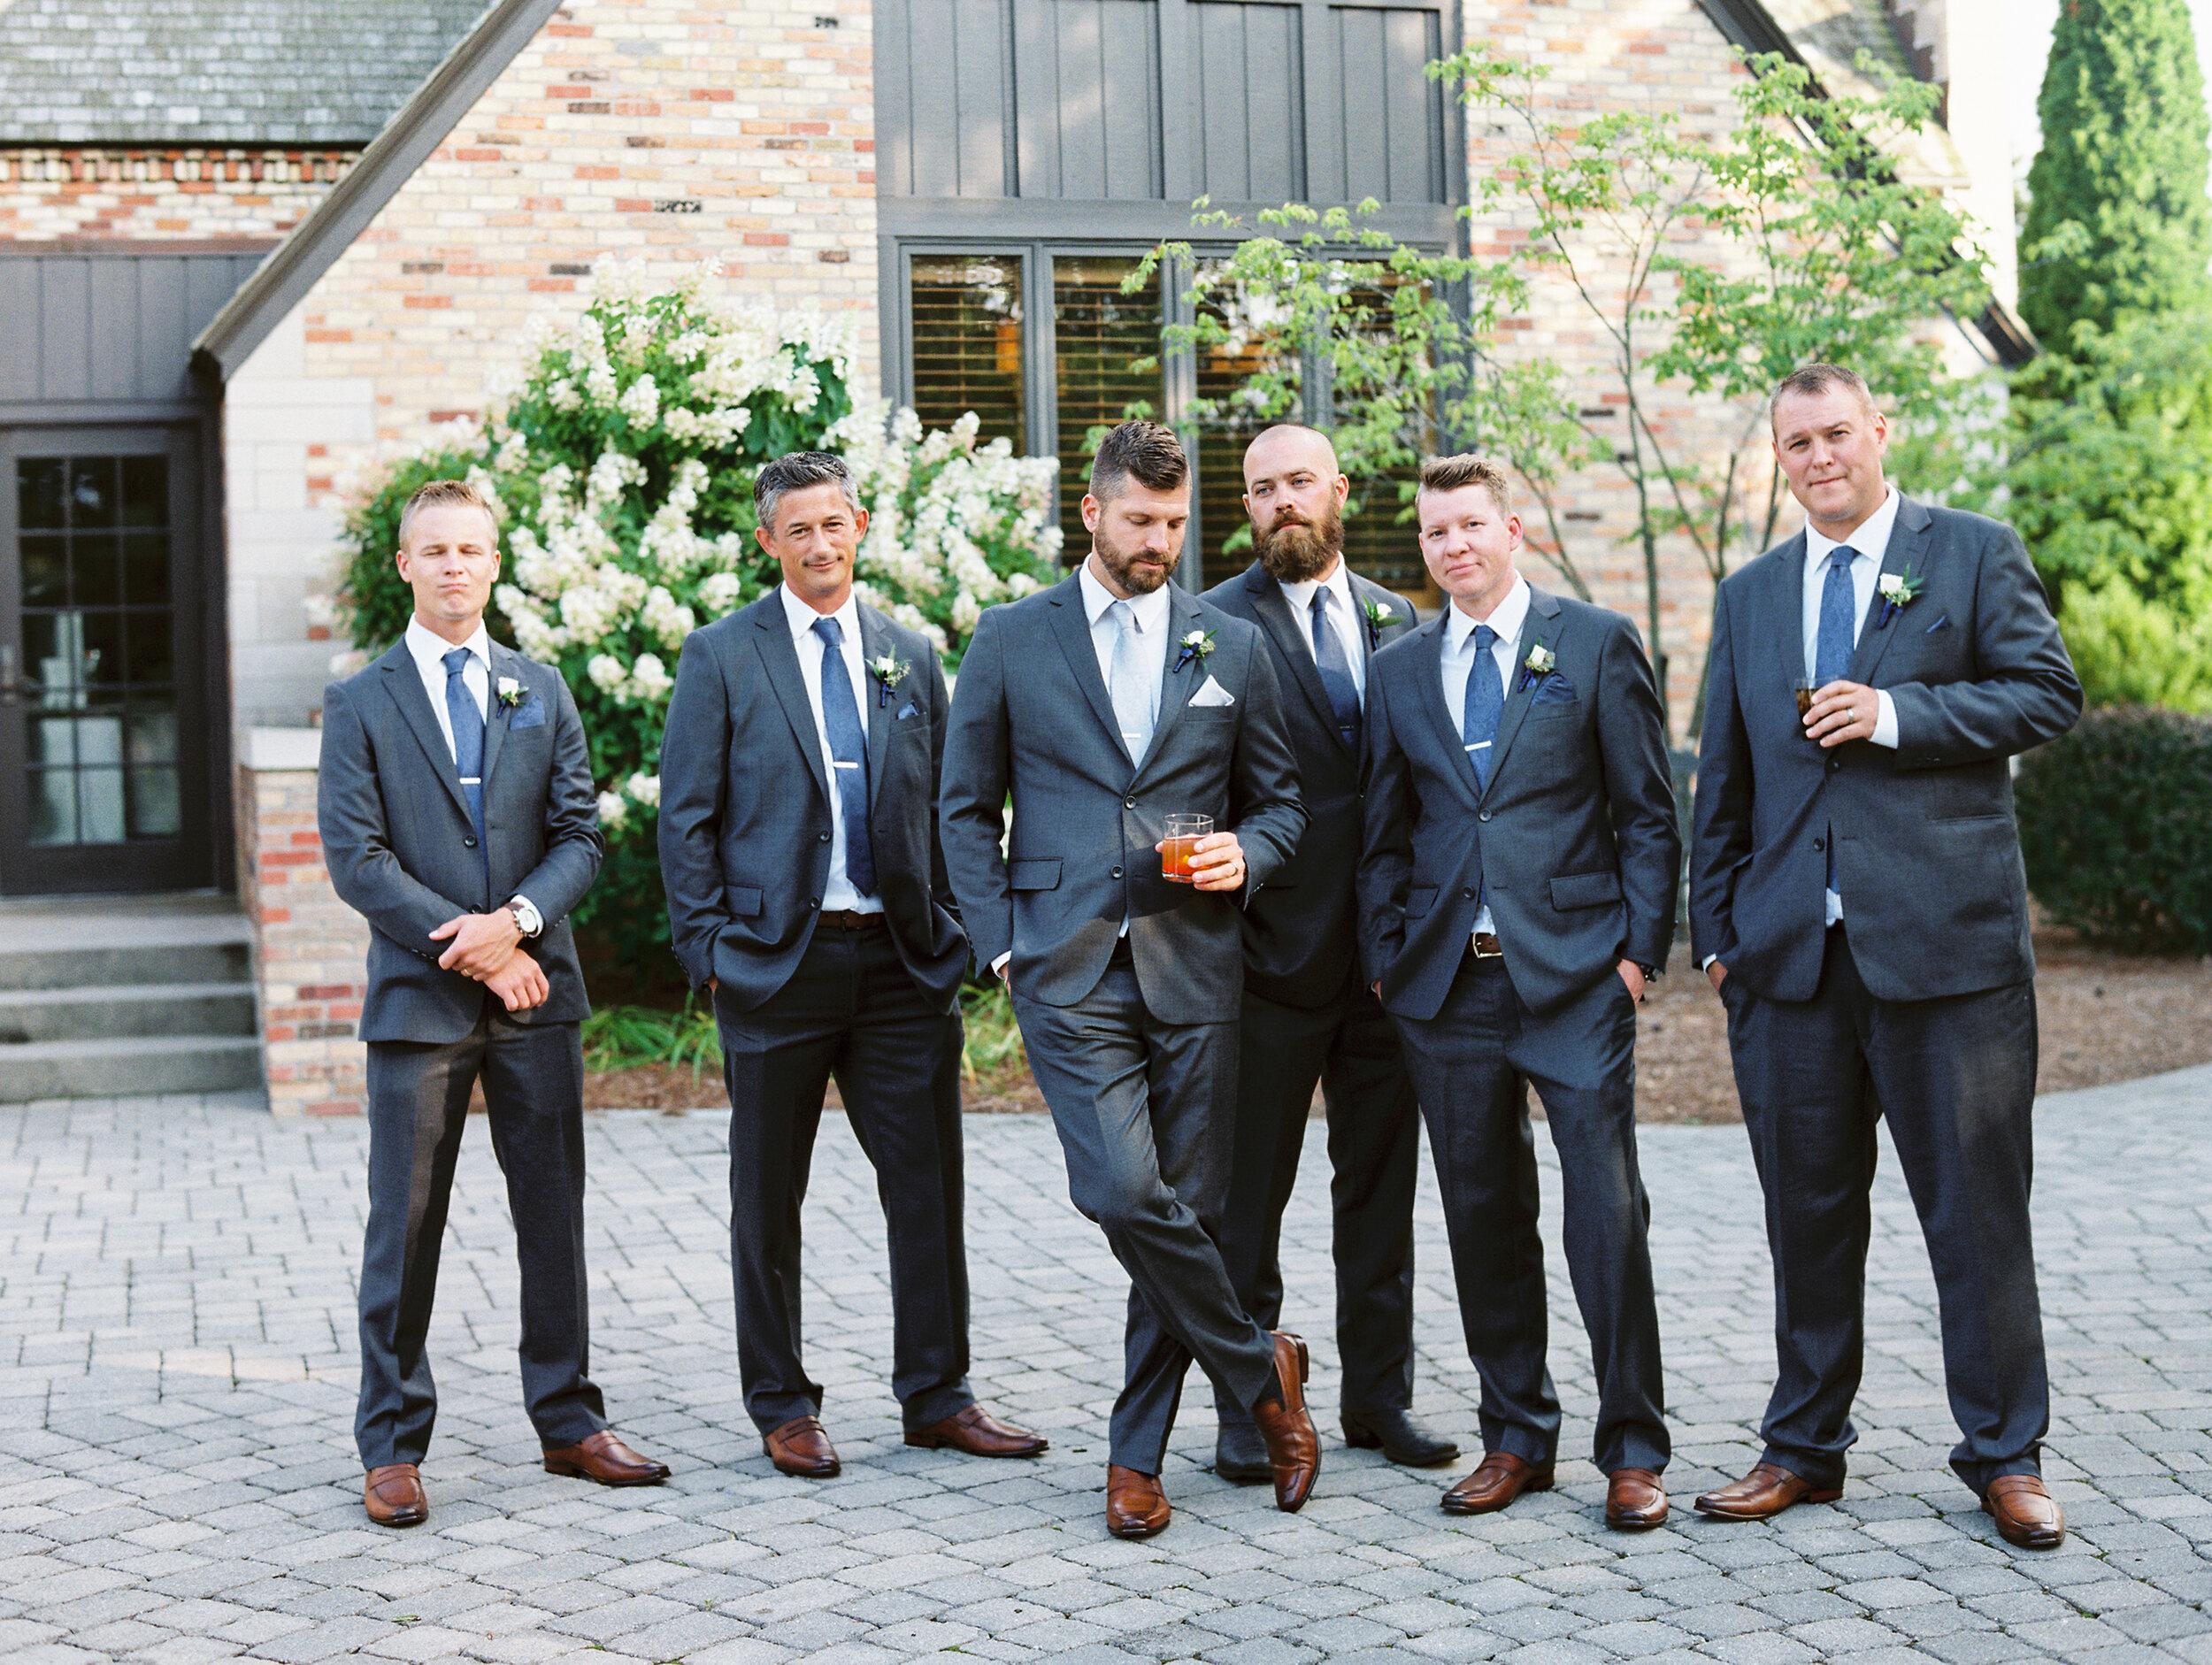 Kuiper+Wedding+Reception+Bridal+Party-120.jpg